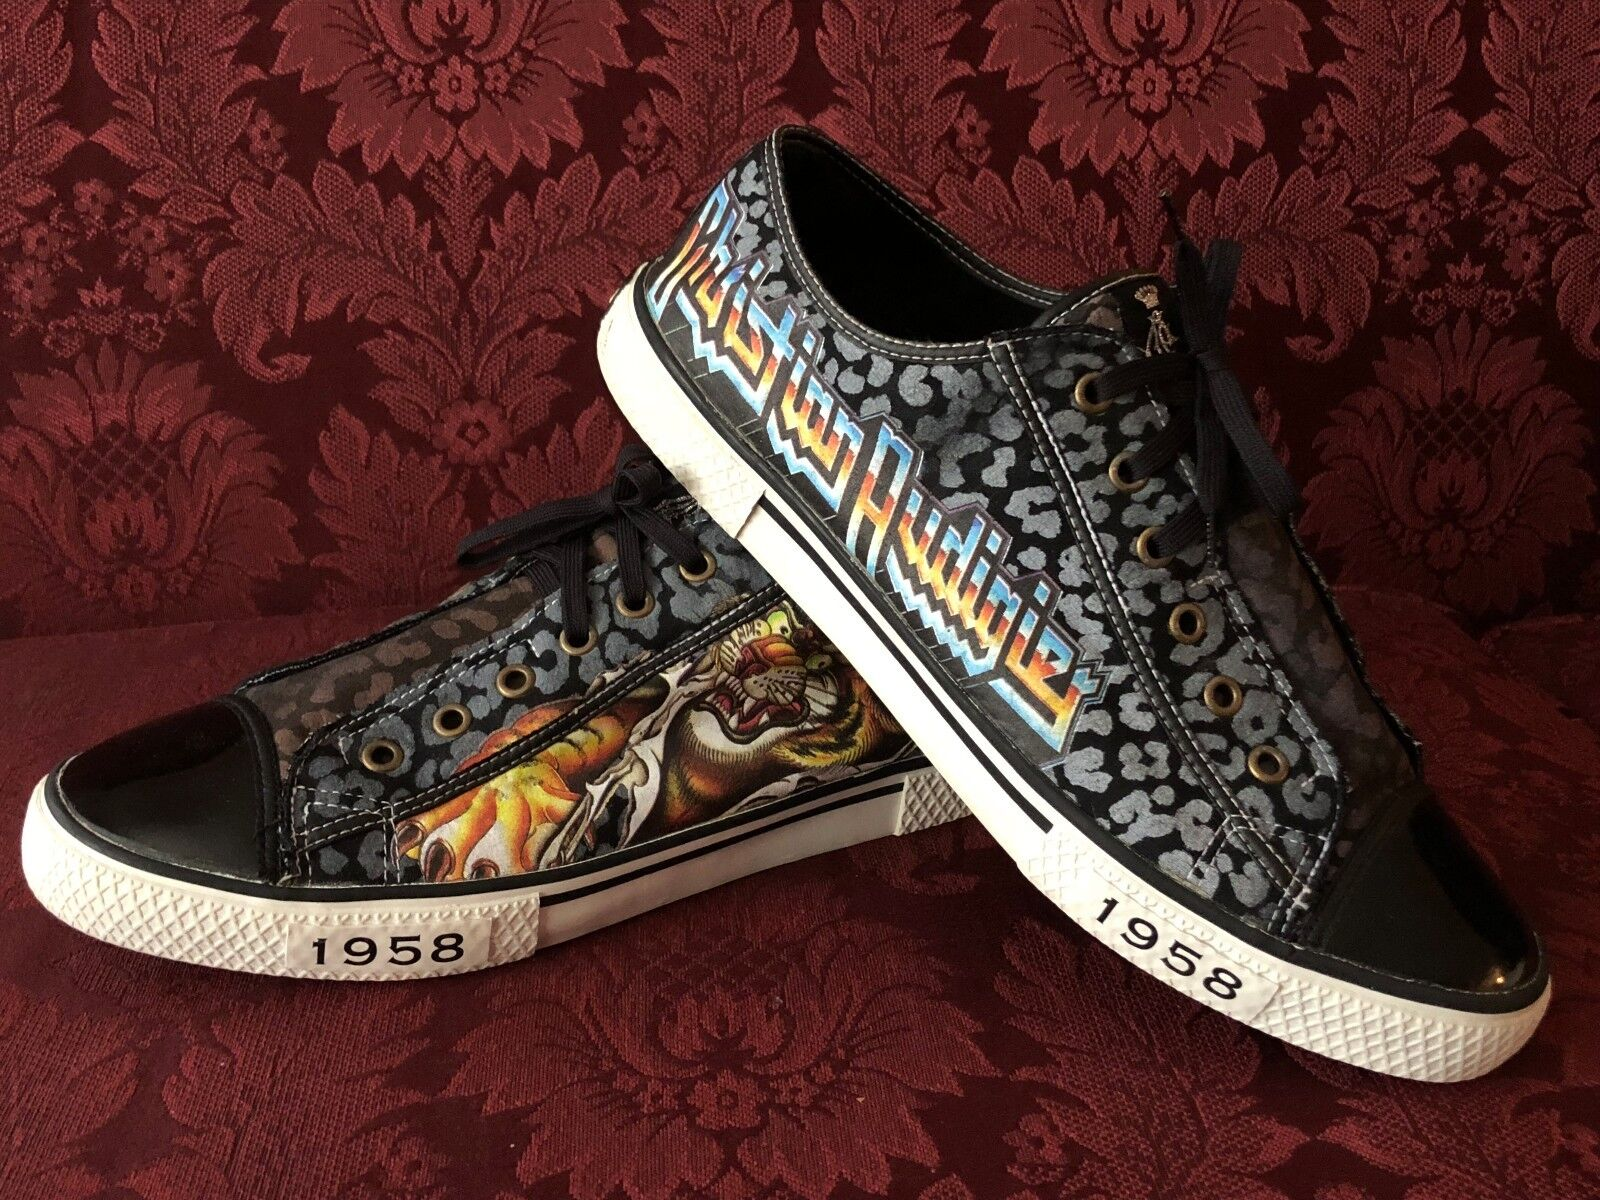 Christian Audigier Casual Sneakers Men Size 11